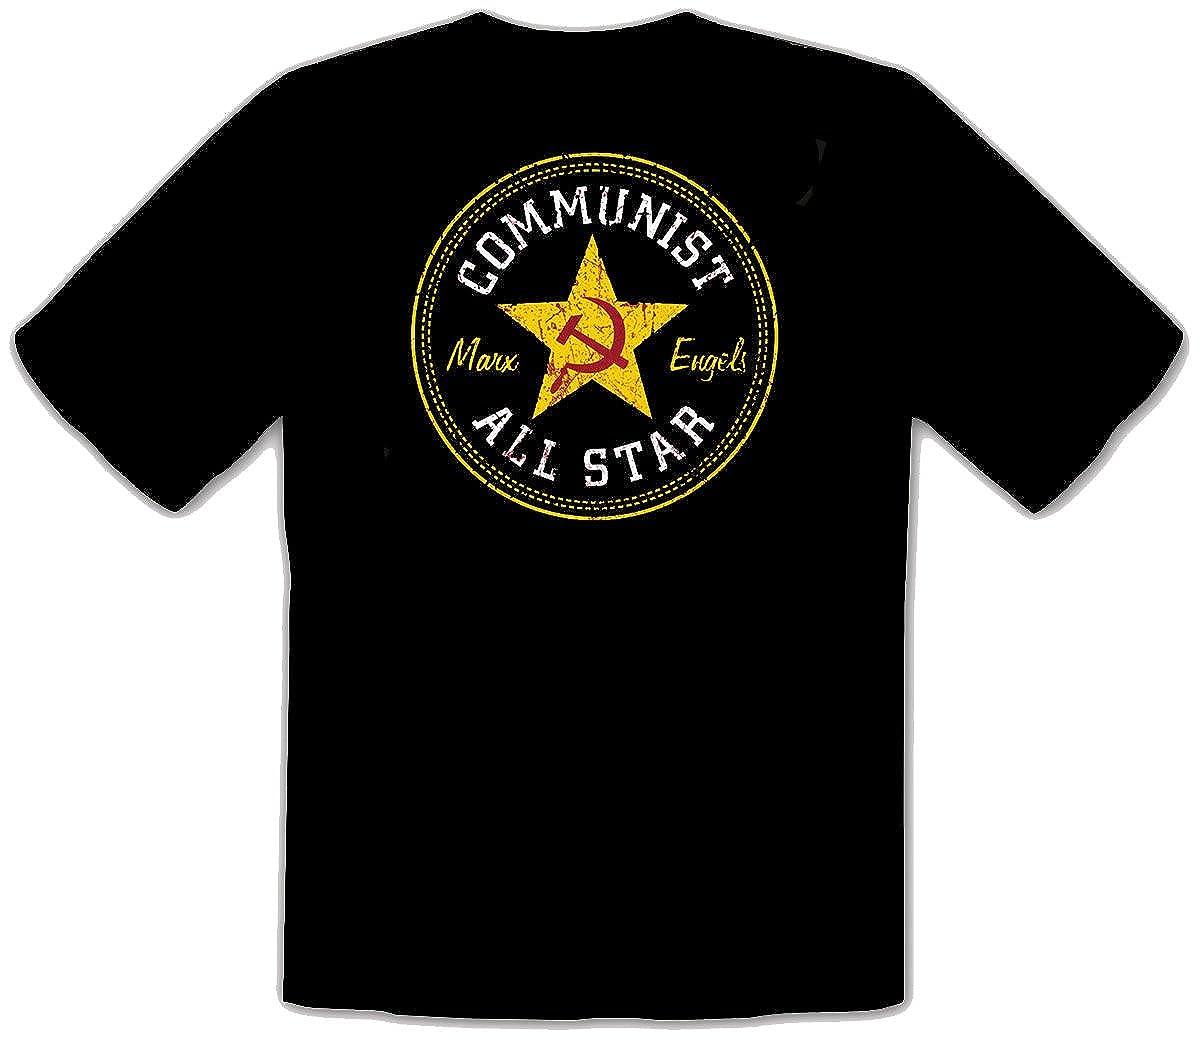 Converse All Star Communist Marx Engrls Fun T Shirt 014